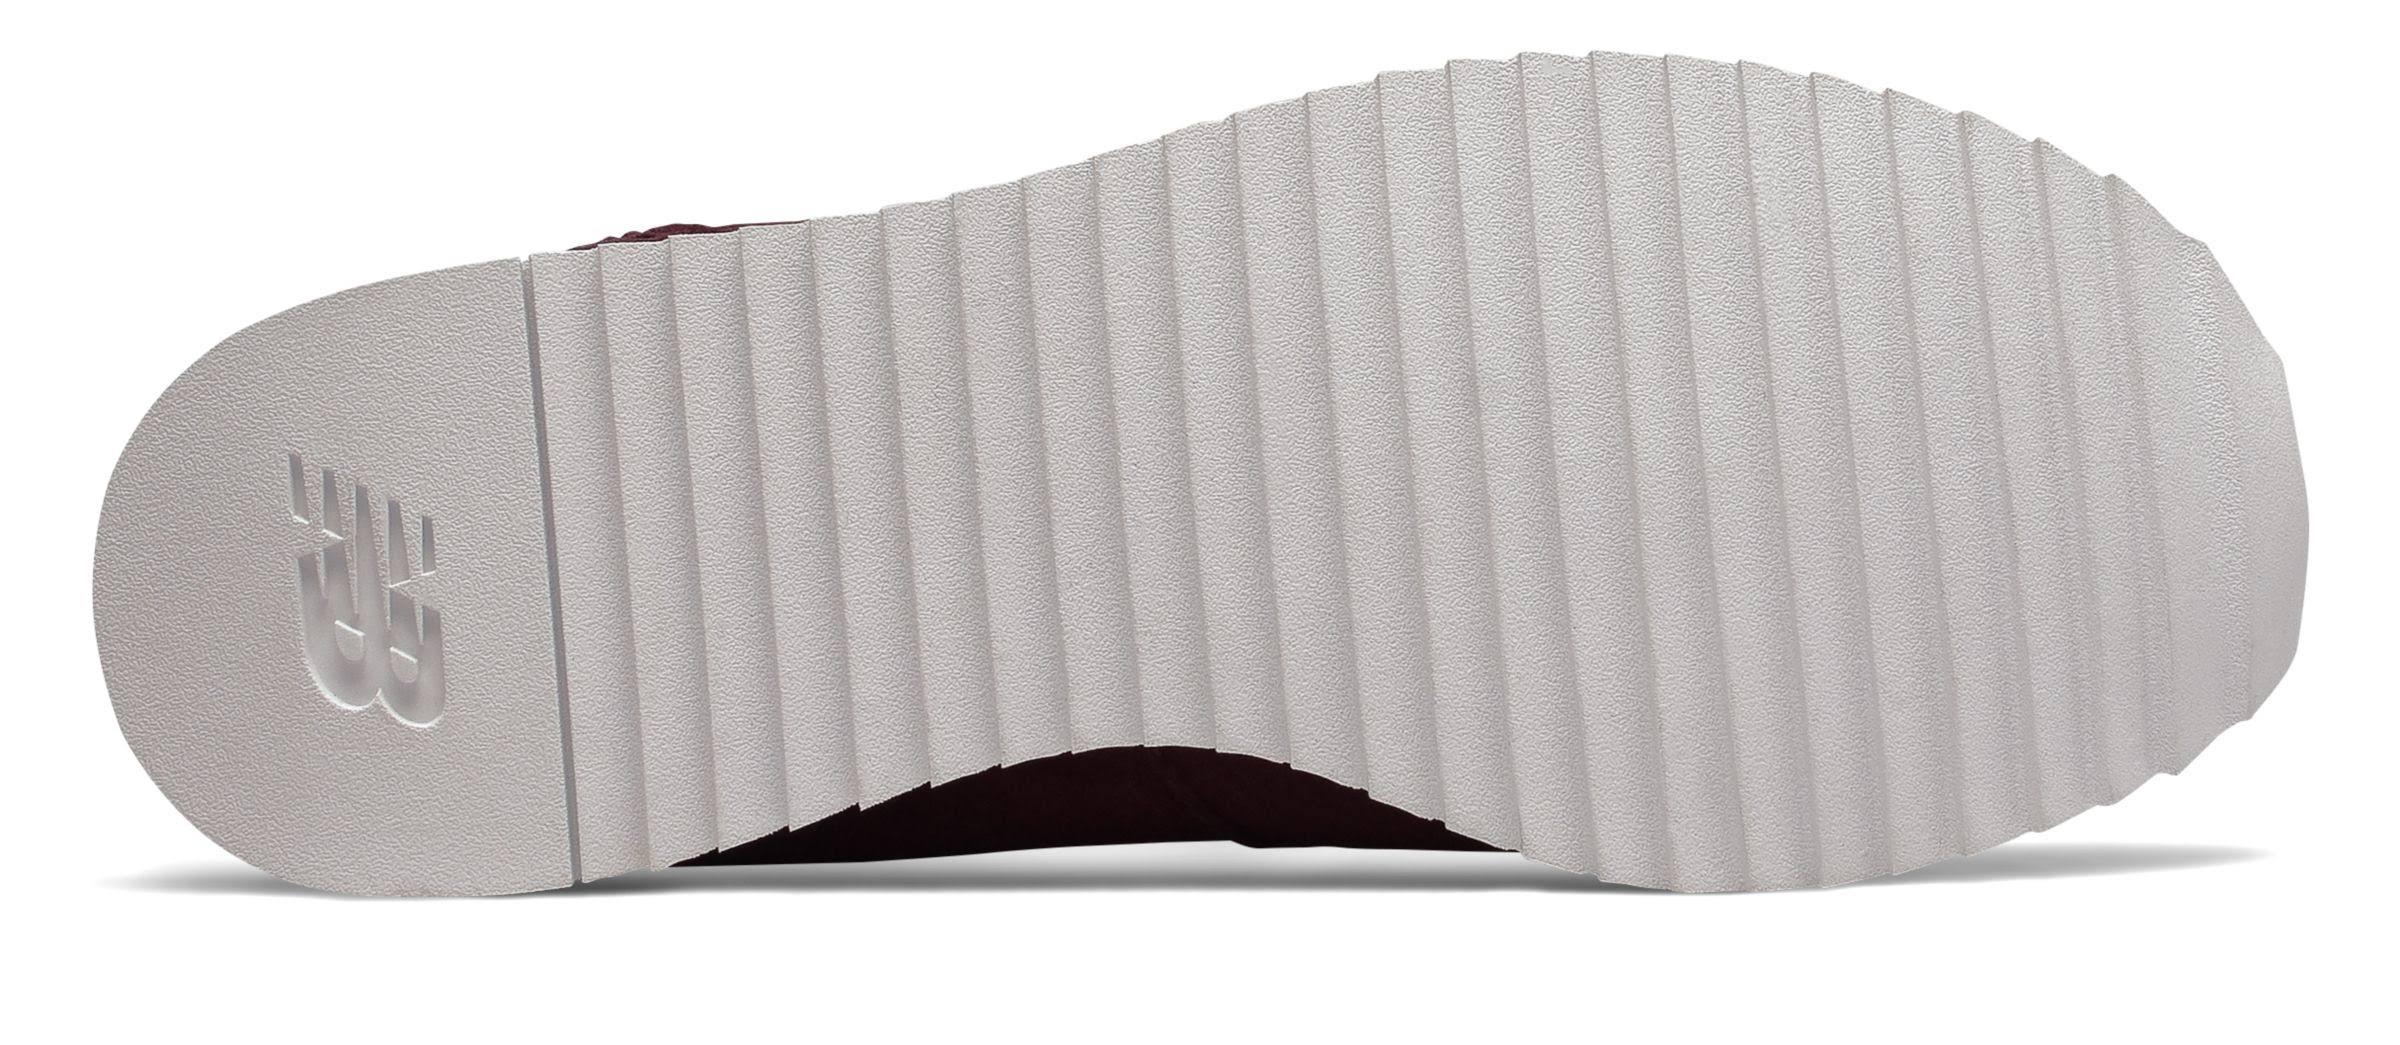 Casual 6 New Plateauschuh Balance weiß 520 Damen Burgundy rqq0IBx